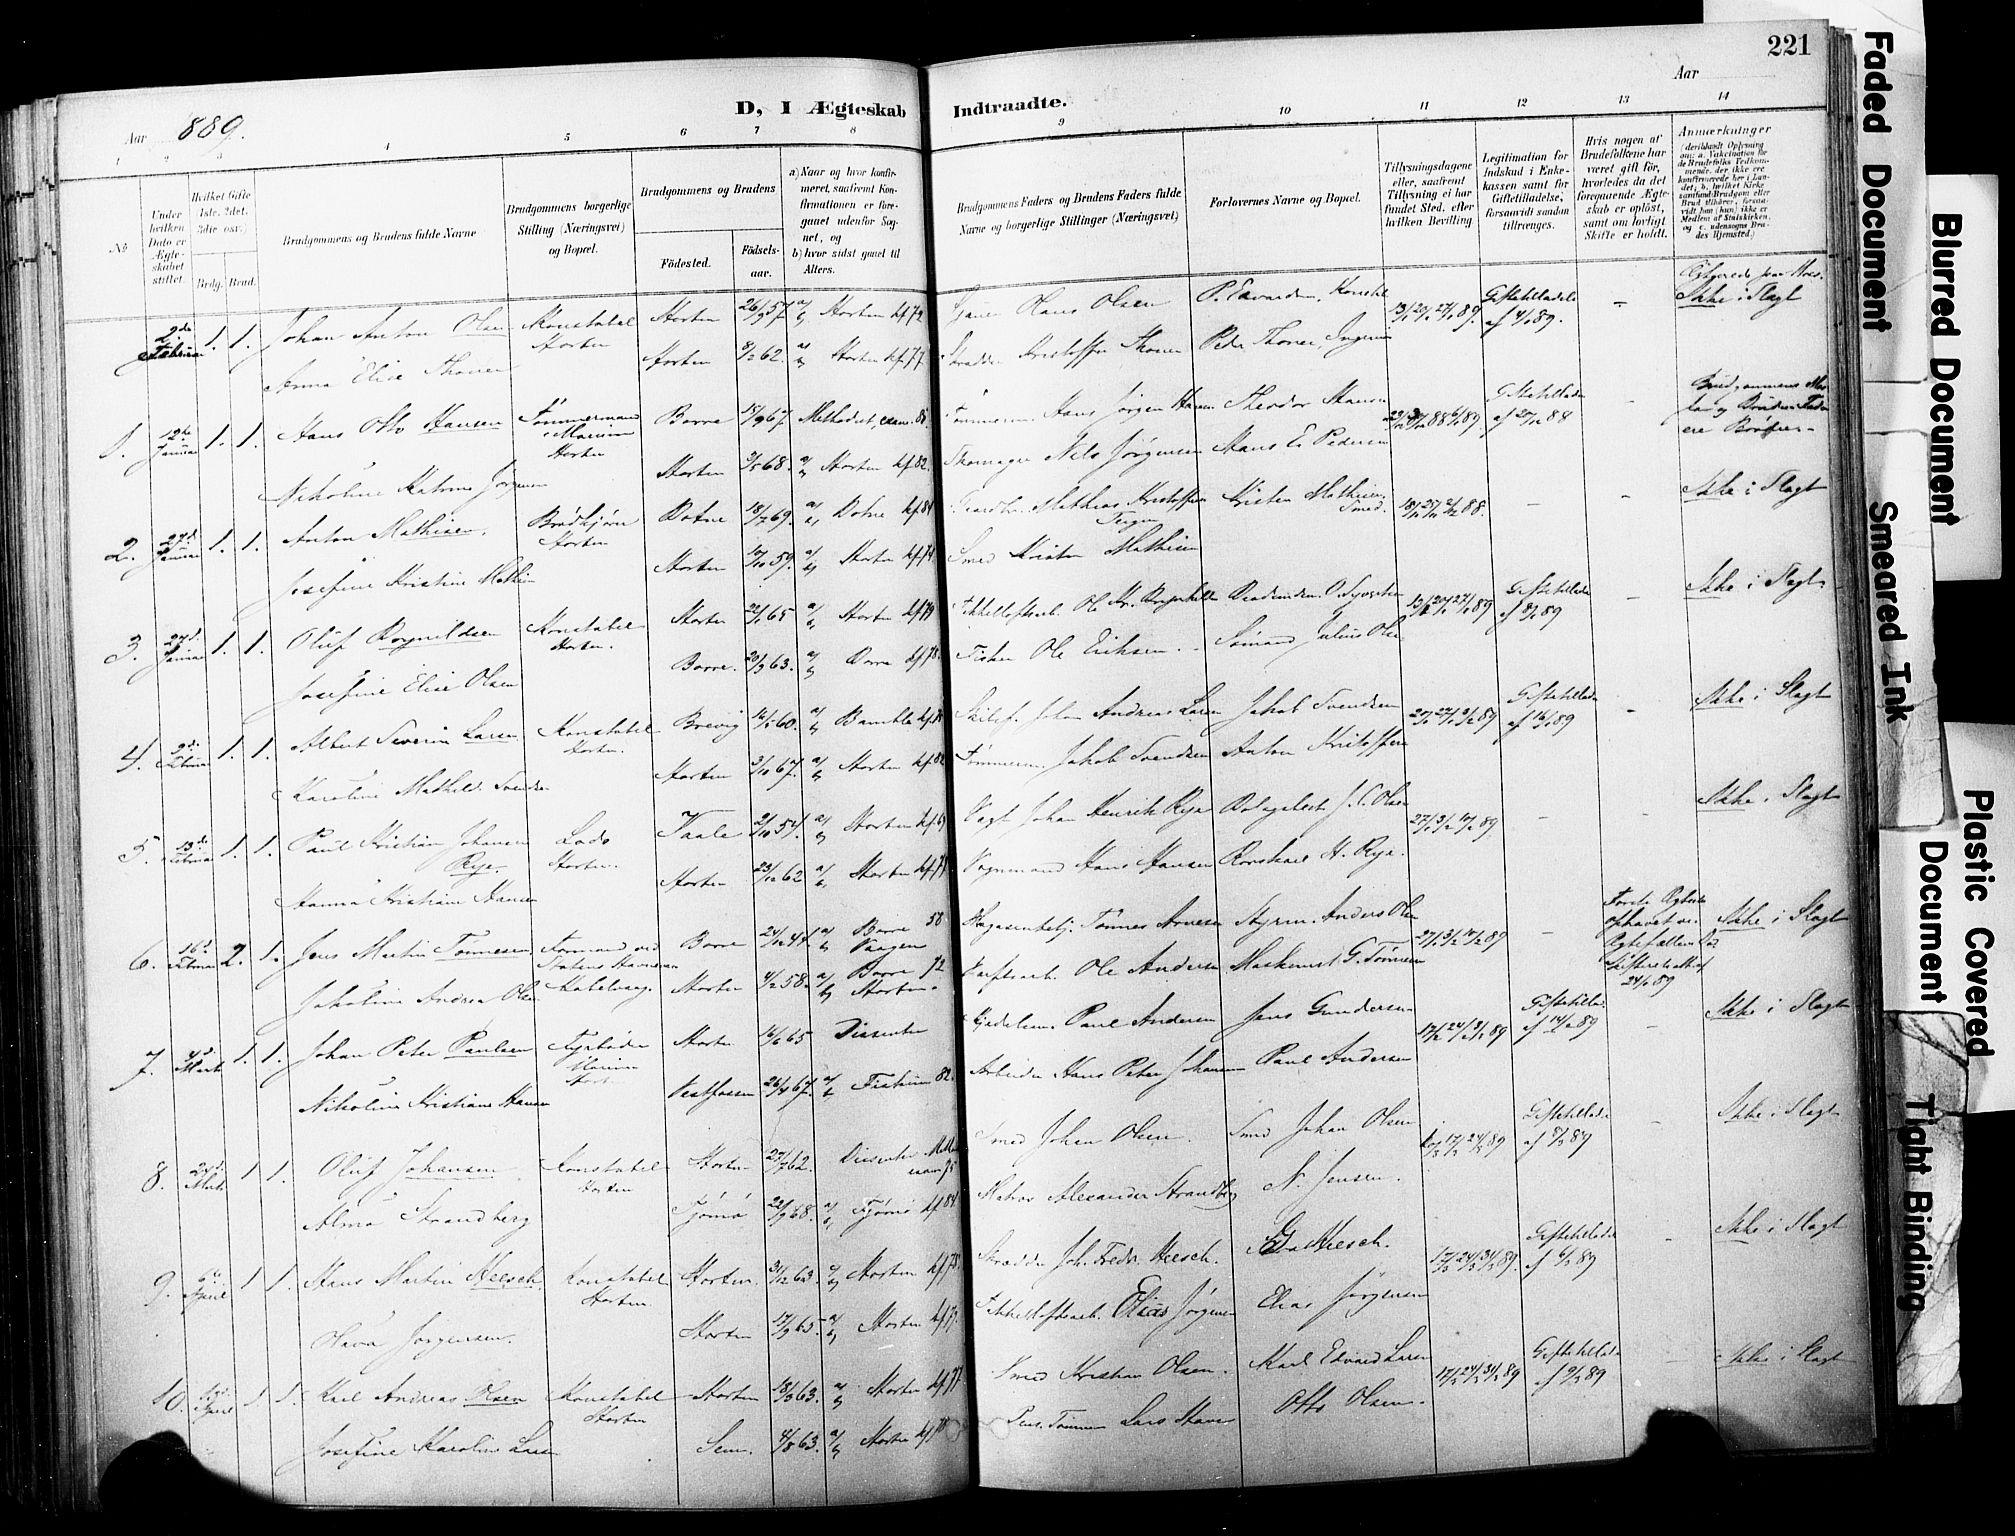 SAKO, Horten kirkebøker, F/Fa/L0004: Parish register (official) no. 4, 1888-1895, p. 221